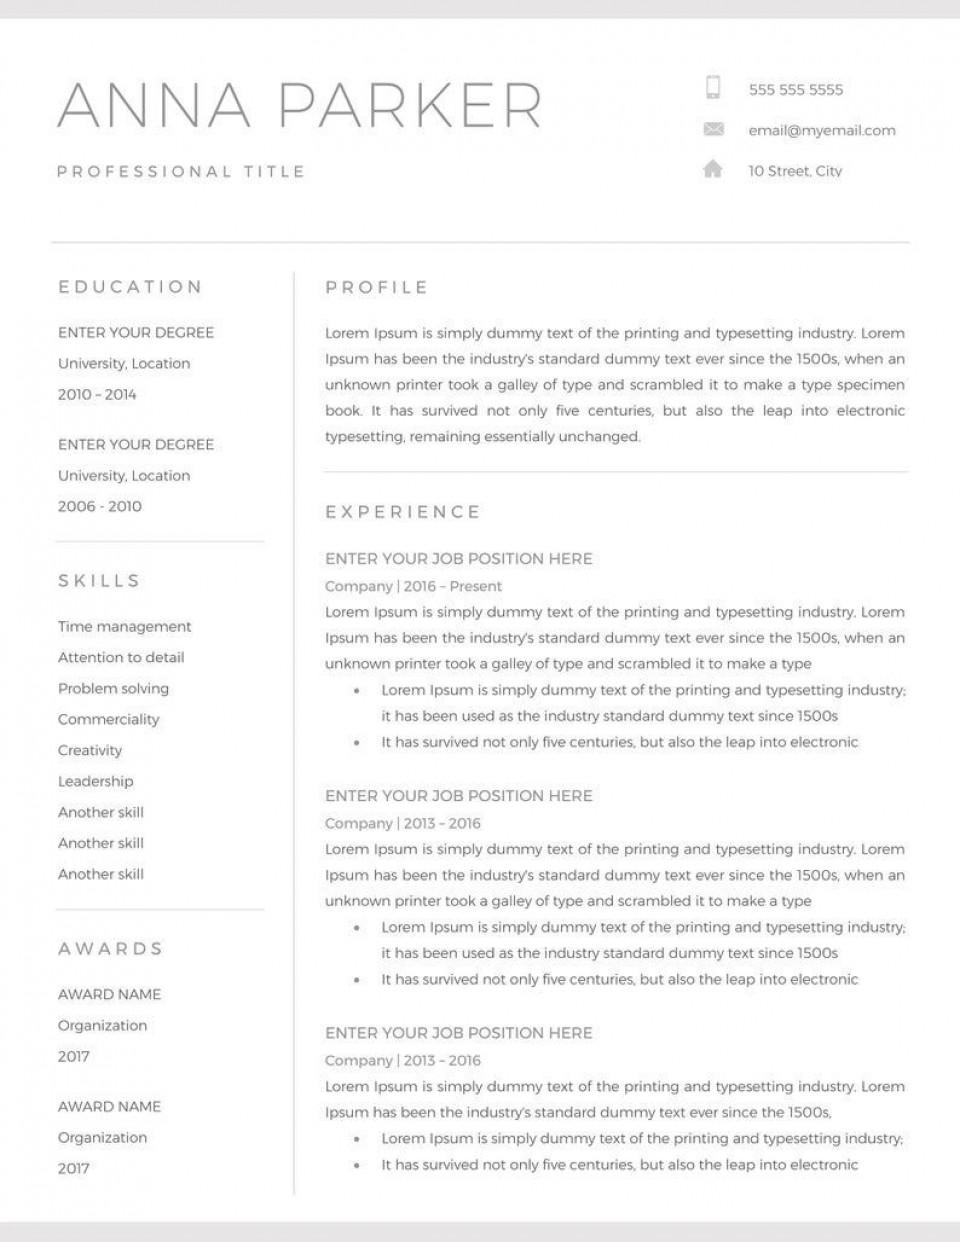 007 Unique Skill Based Resume Template Word Picture  Microsoft960